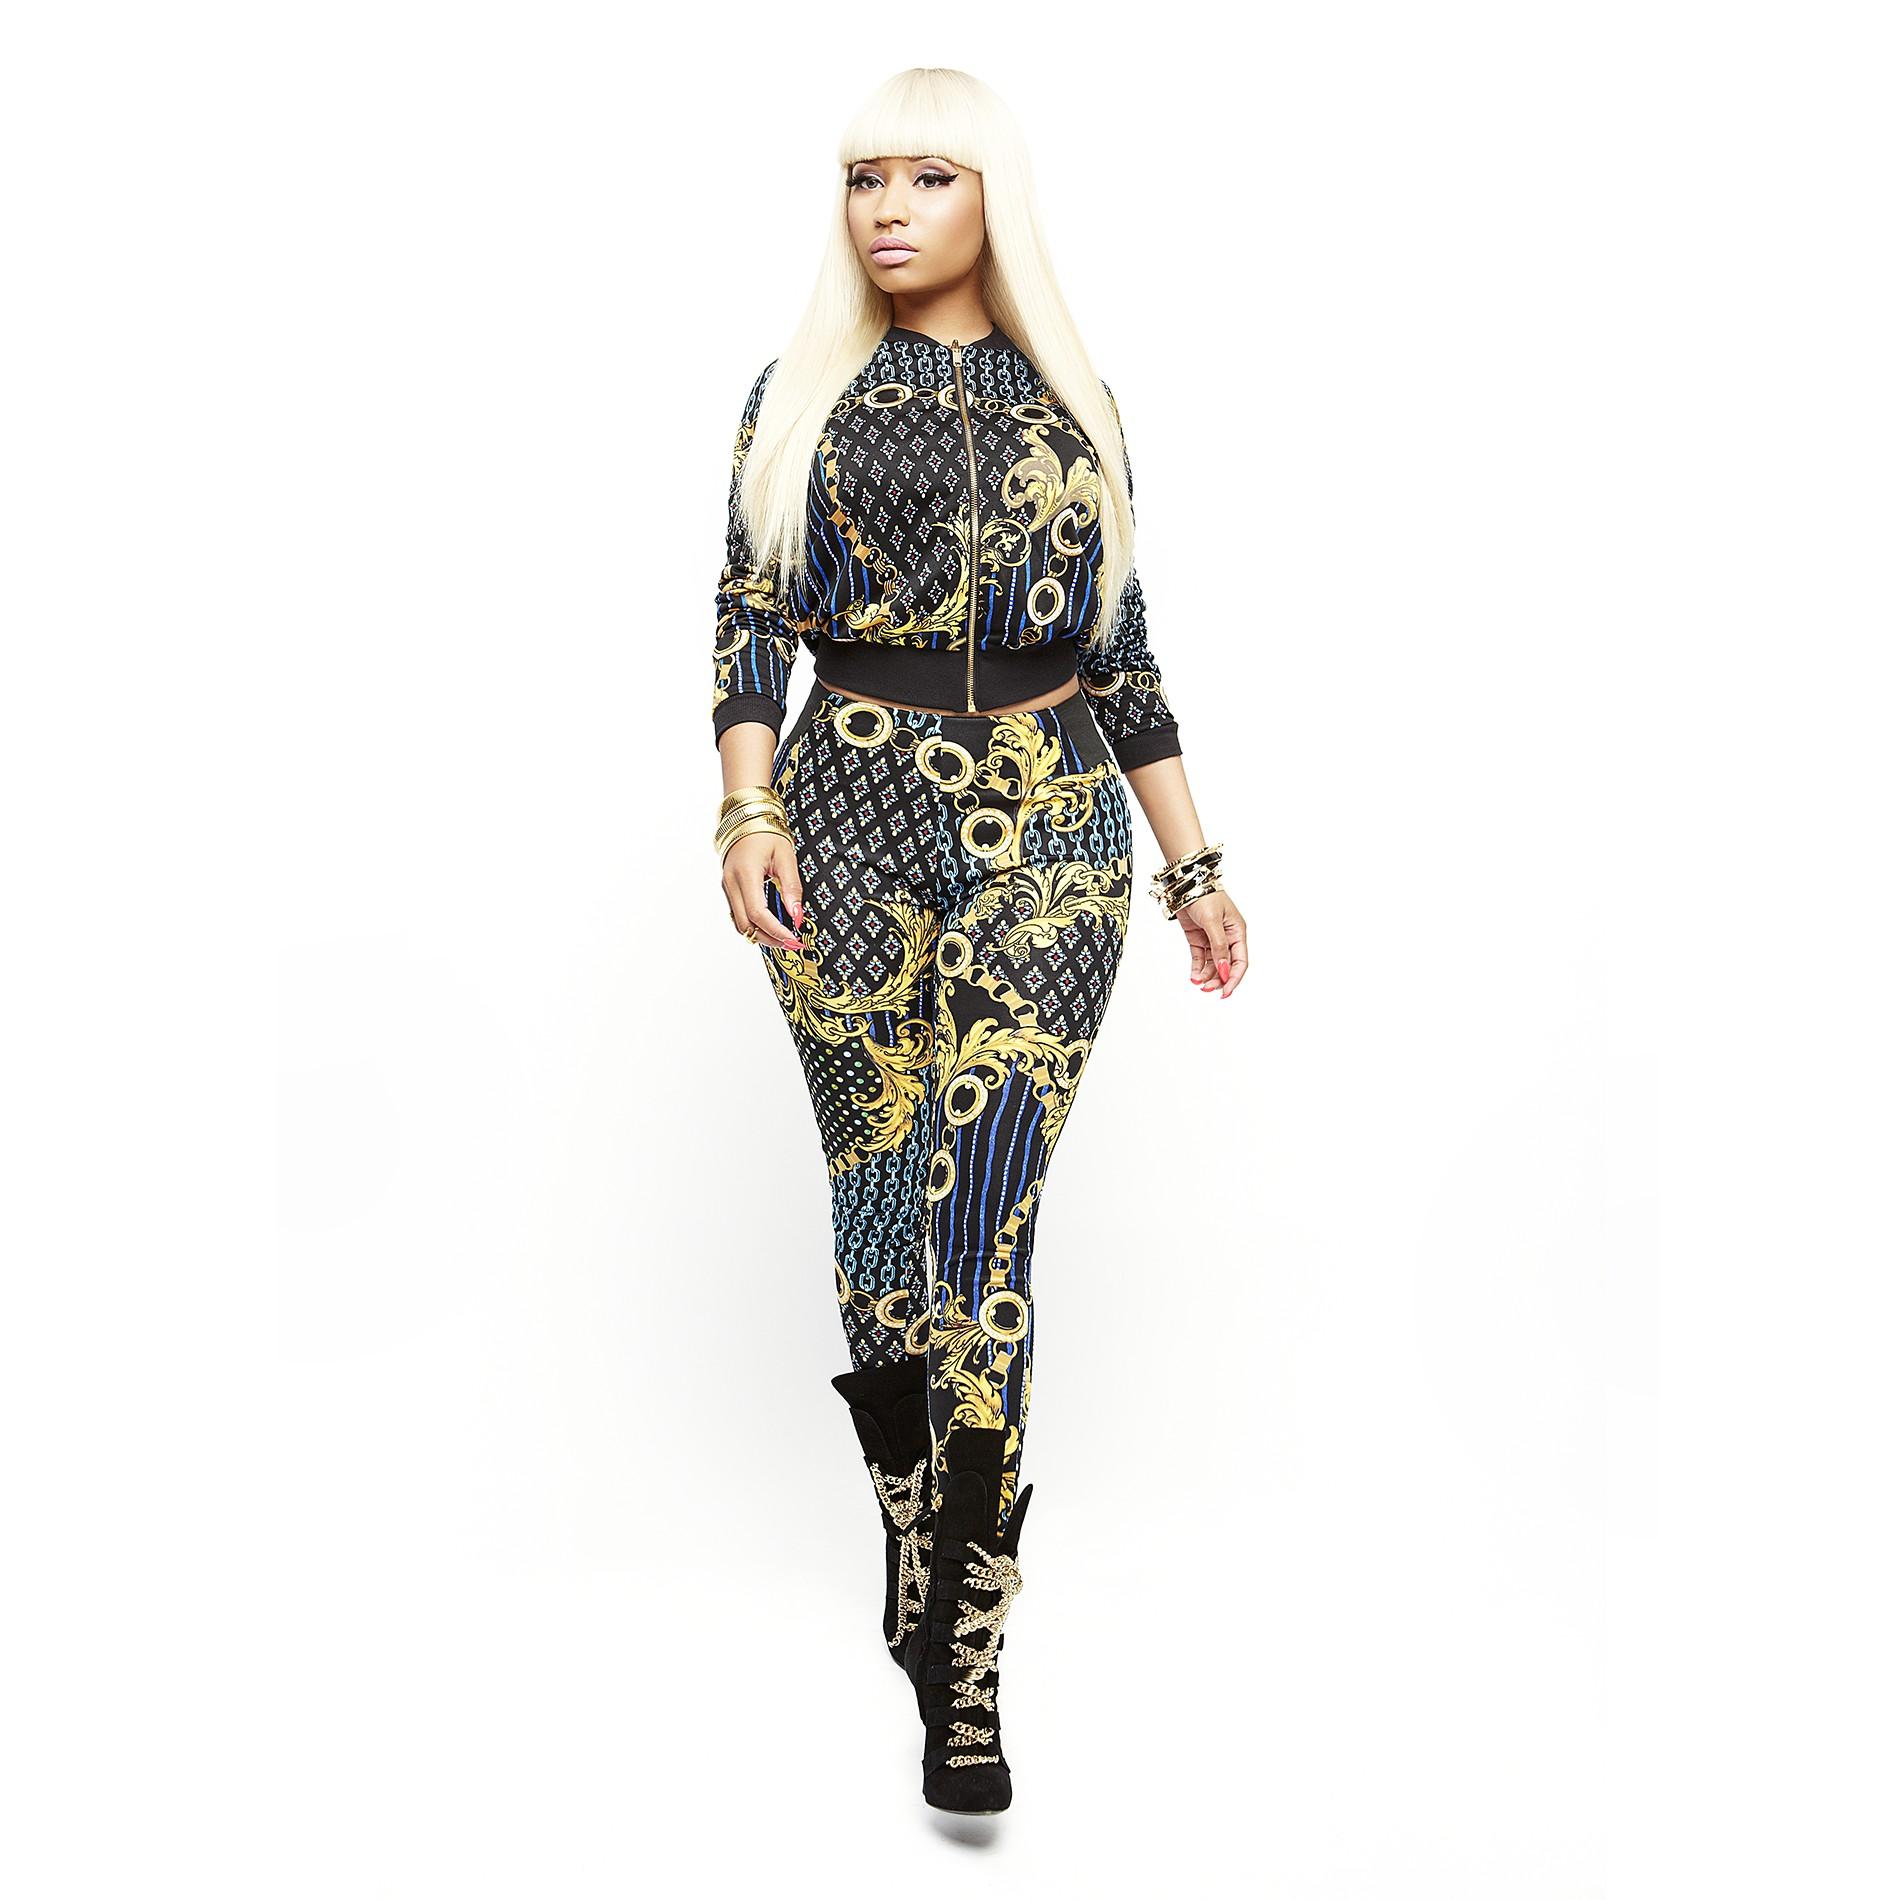 Nicki Minaj Women's Bomber Jacket - Chain Print - Clothing - Women's - Jackets & Blazers